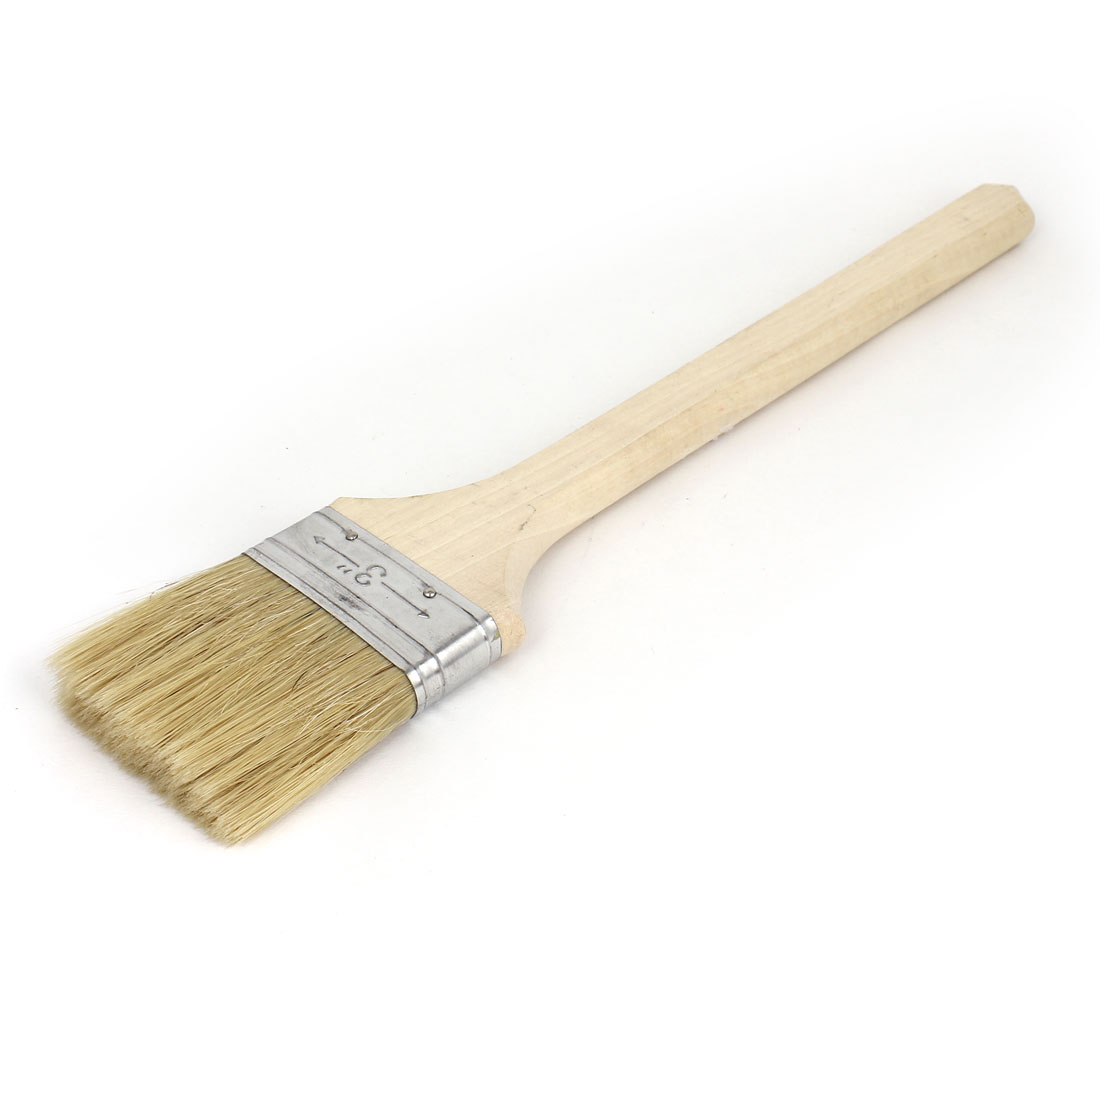 "3"" Width Wooden Handle Bristle Painting Painters Oil Paint Brush Tool"